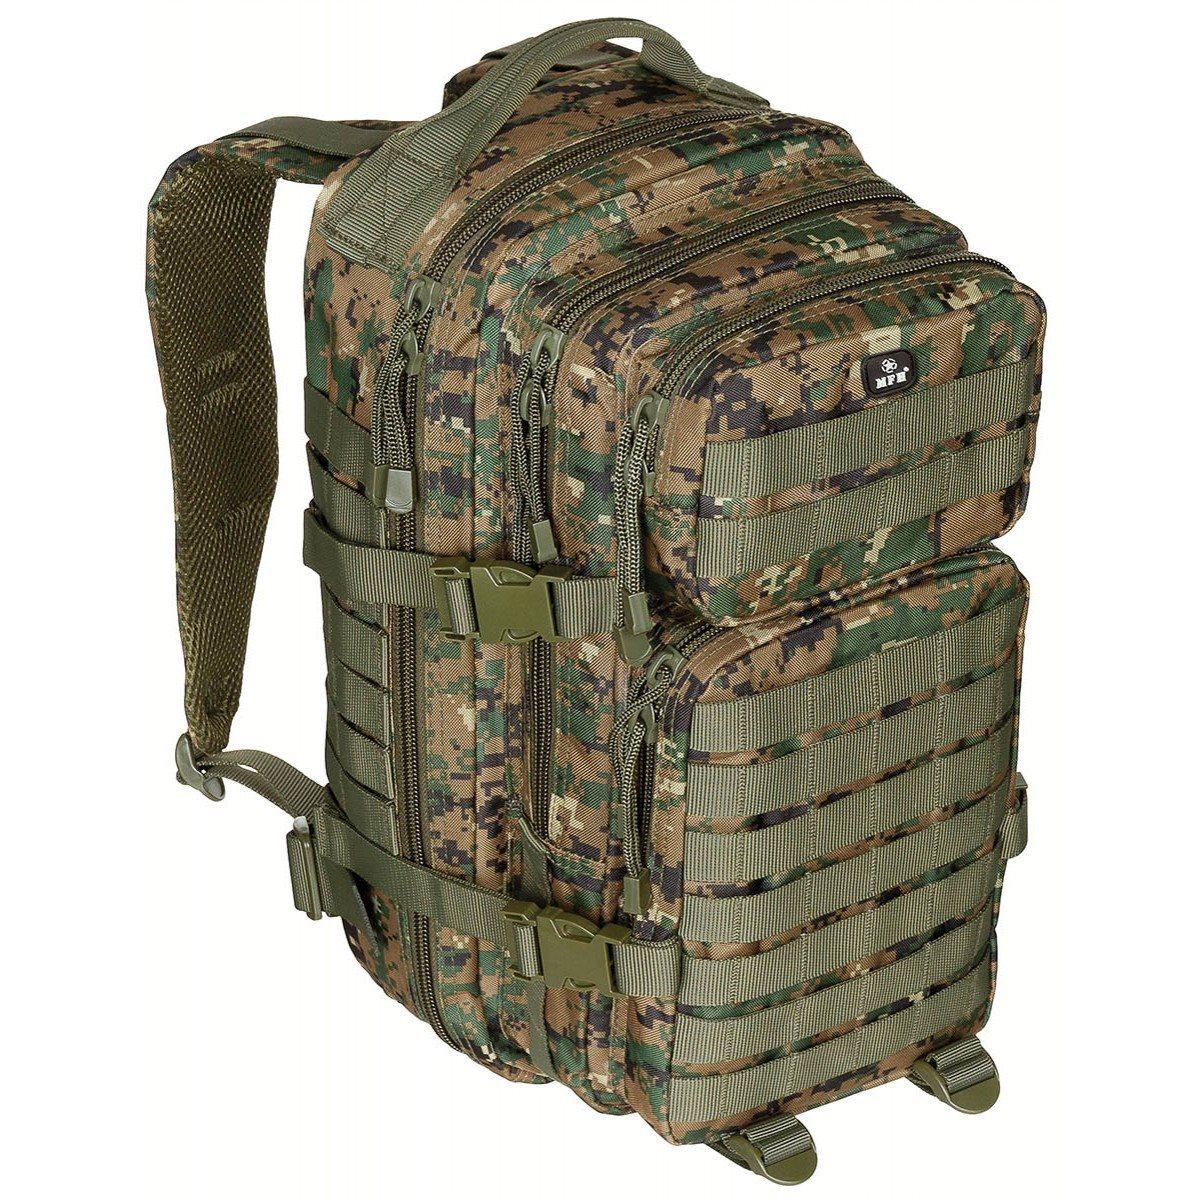 ASSAULT small backpack I DIGITAL WOODLAND MFH int. comp. 30333S L-11